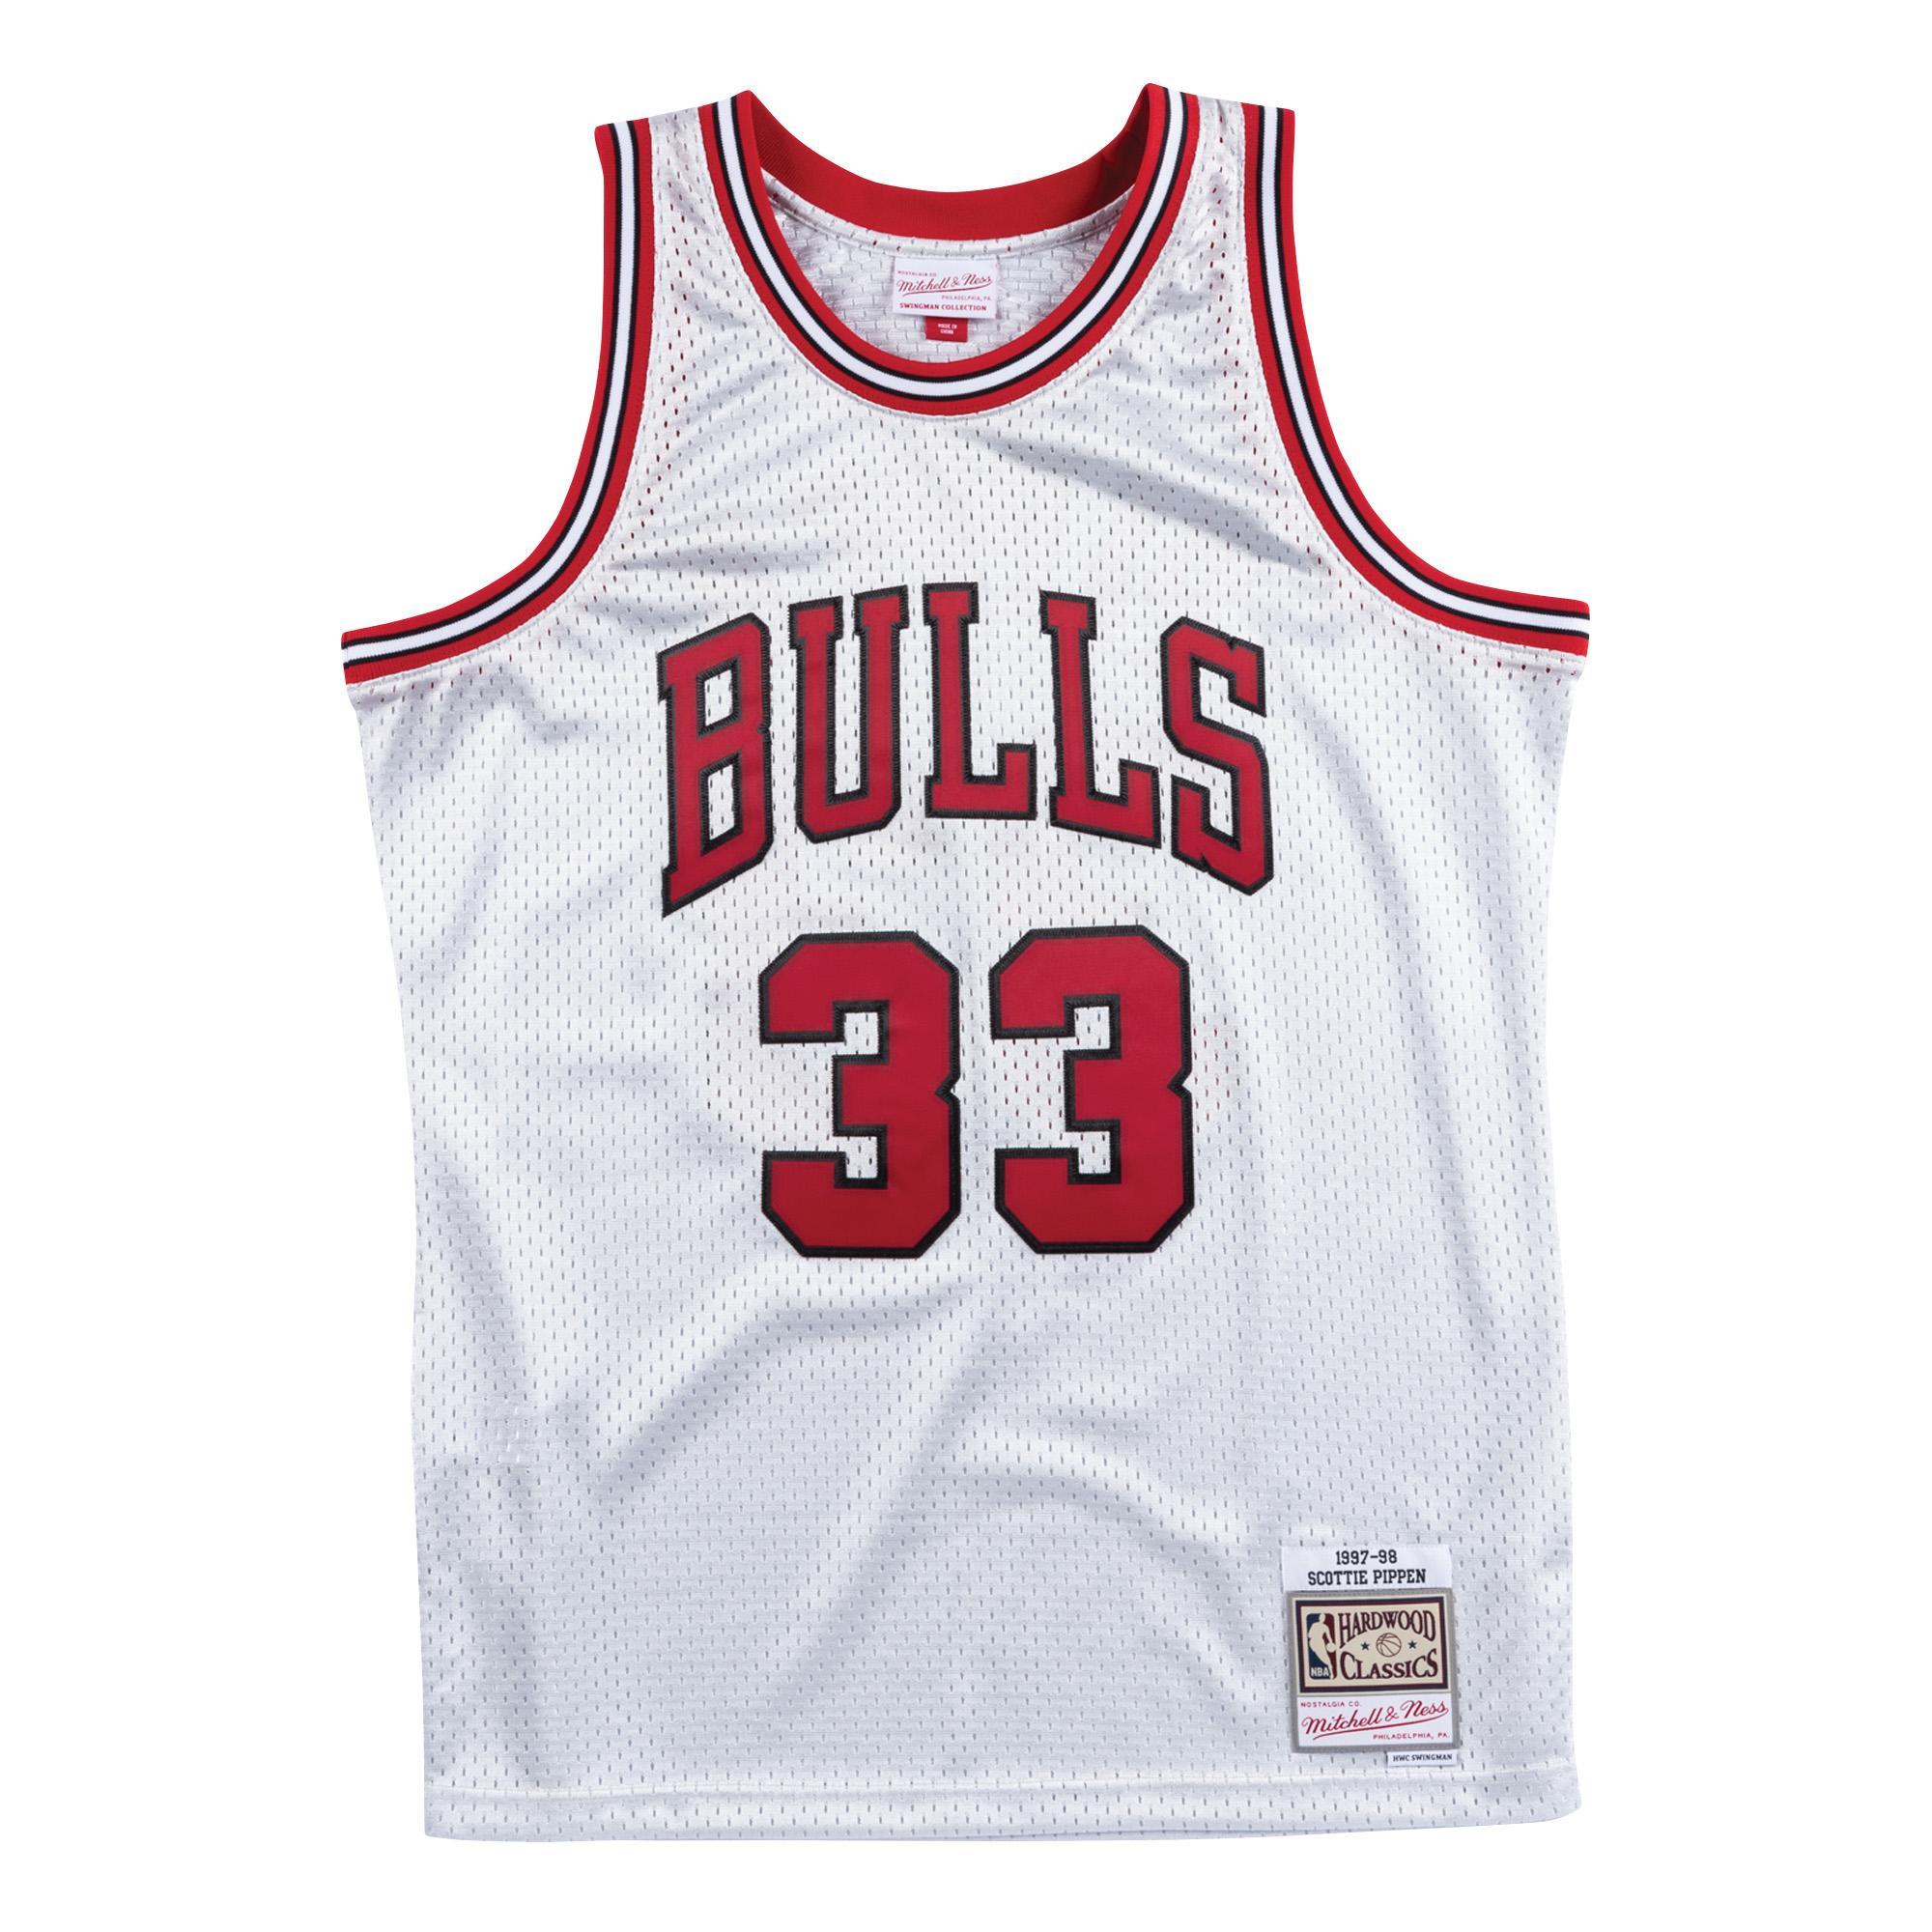 lowest price 68cb6 14ad3 Mitchell & Ness | Chicago Bulls Platinum Swingman Jersey ...